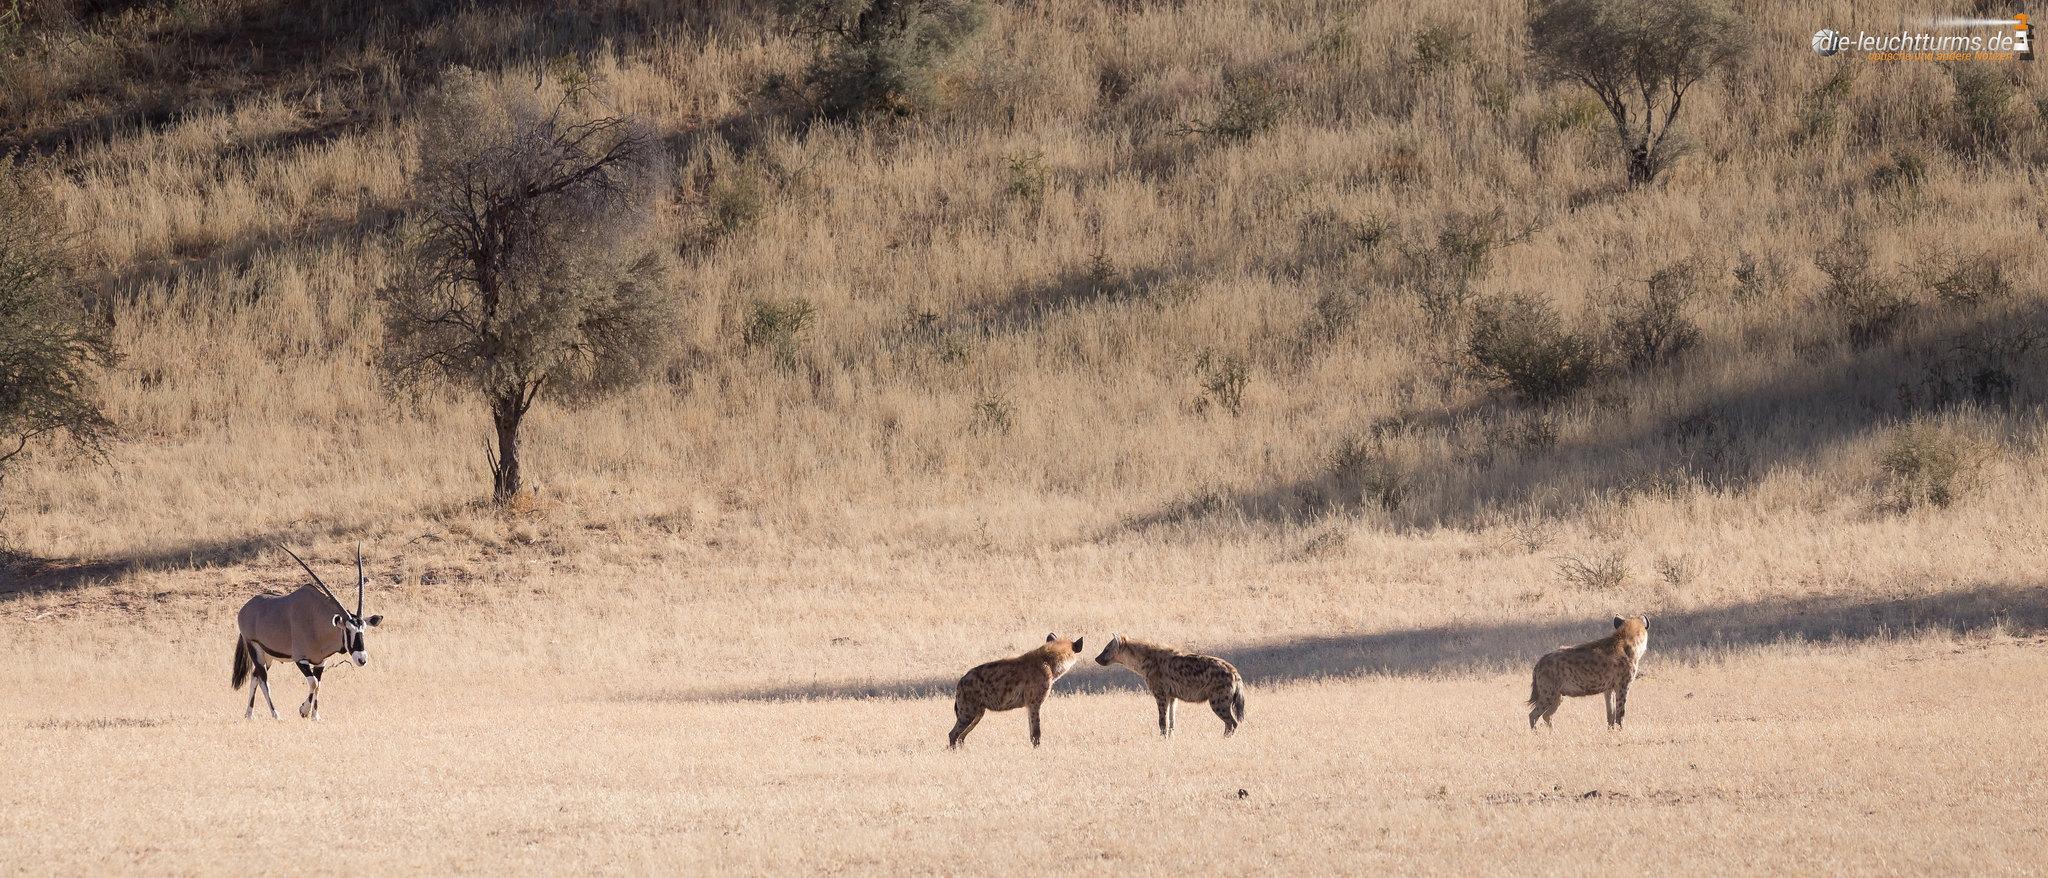 Spotted hyenas and Gemsbok